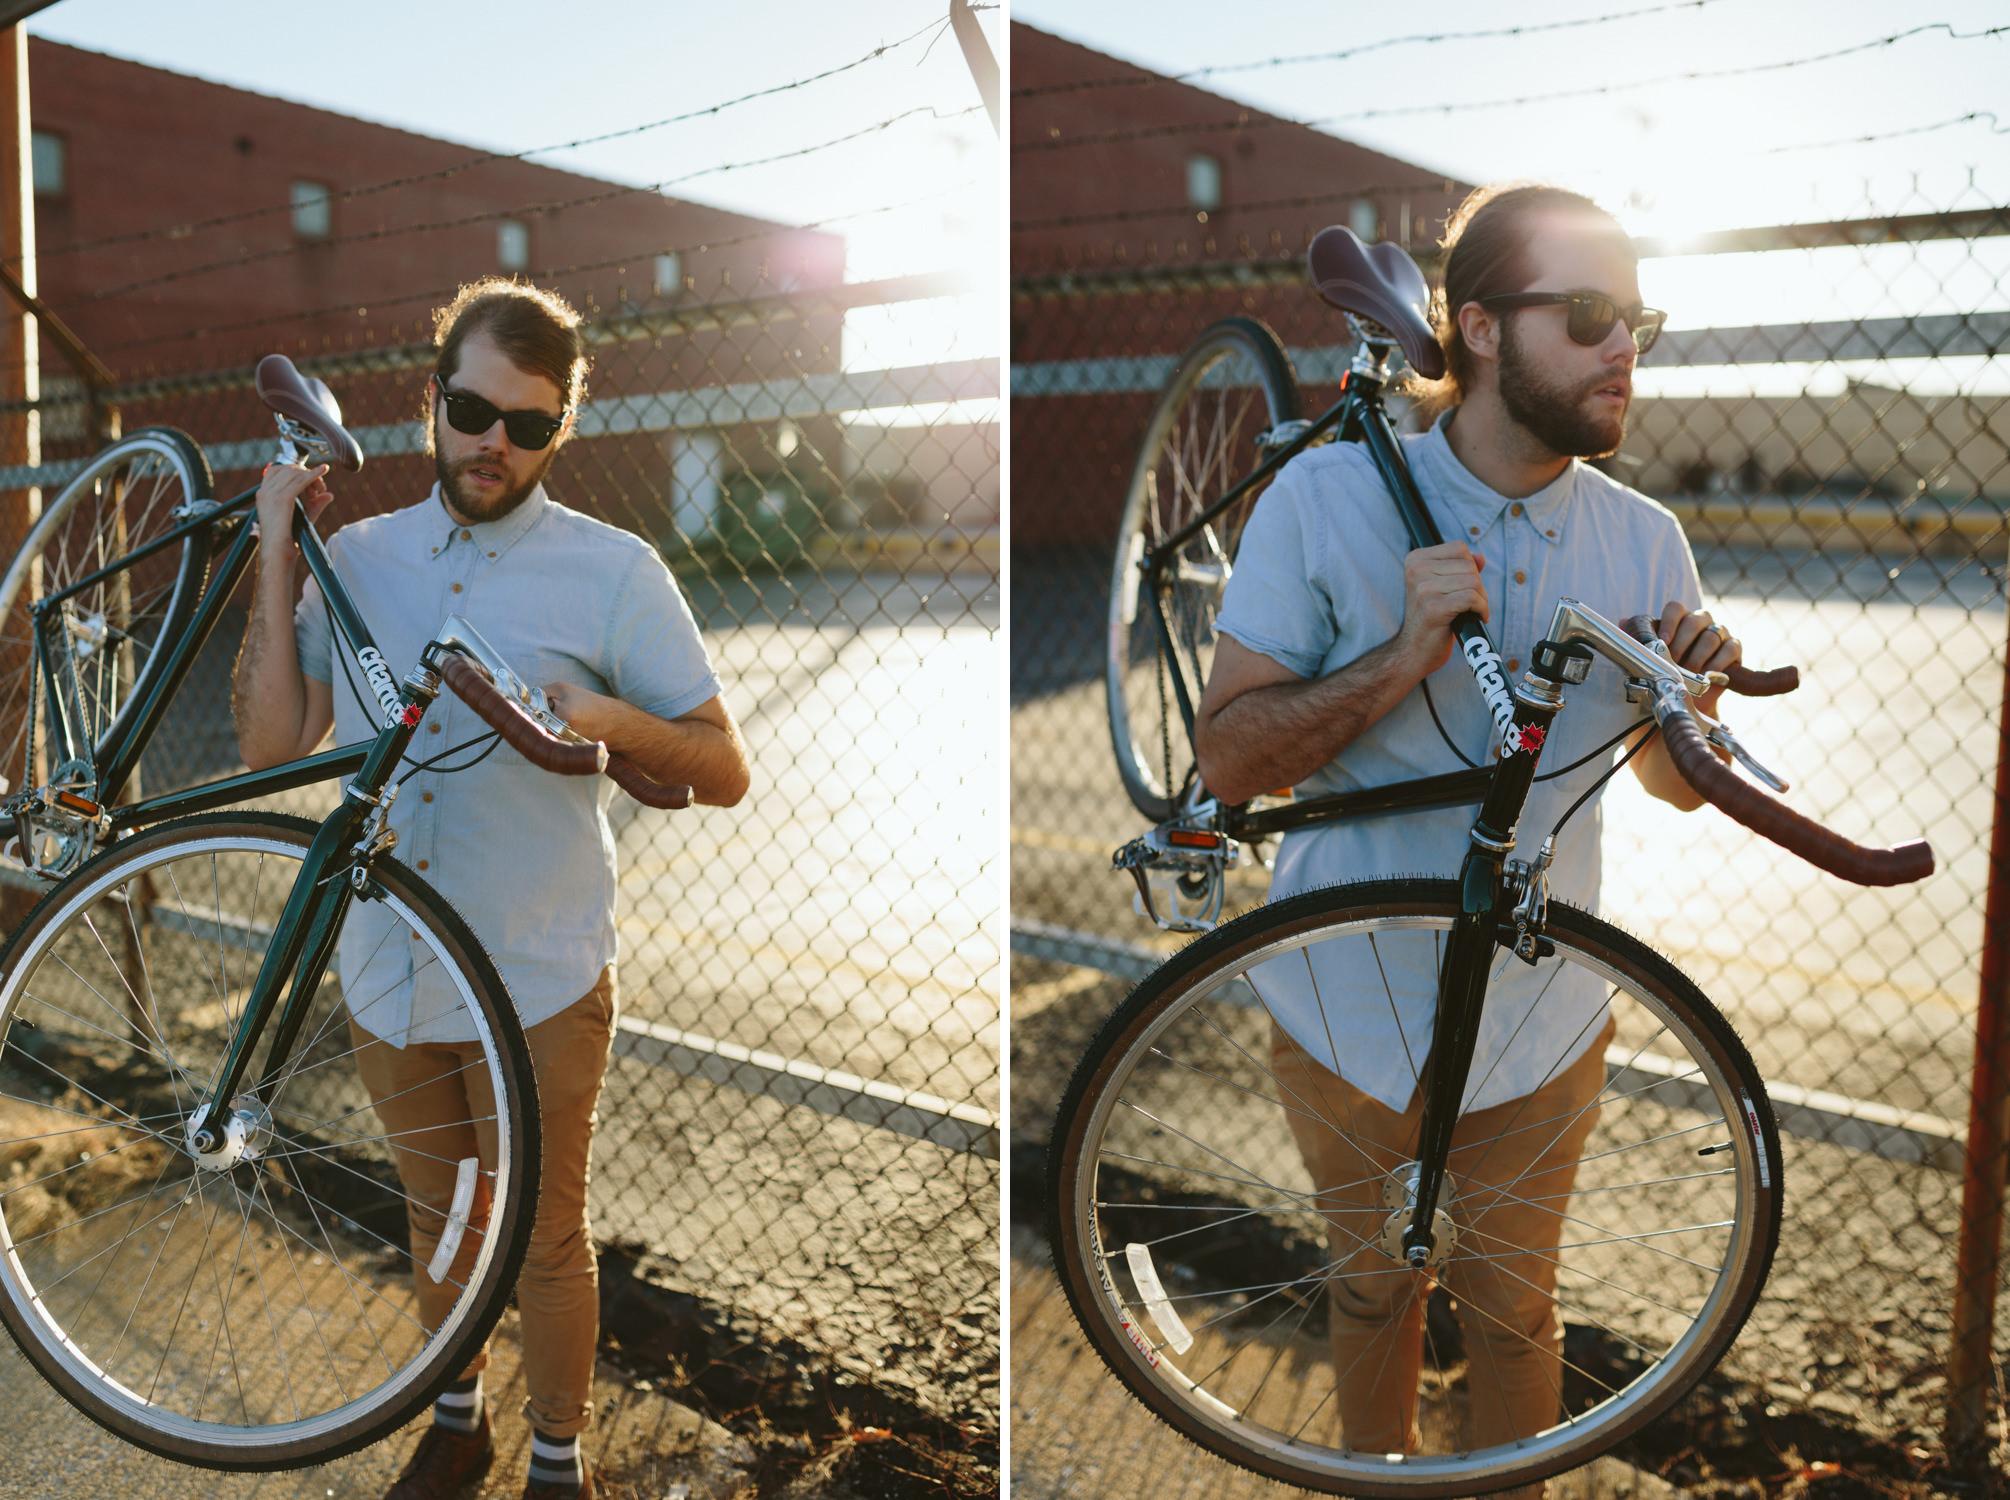 City Life Bike Riding - Kansas City - State Bikes-33copy.JPG